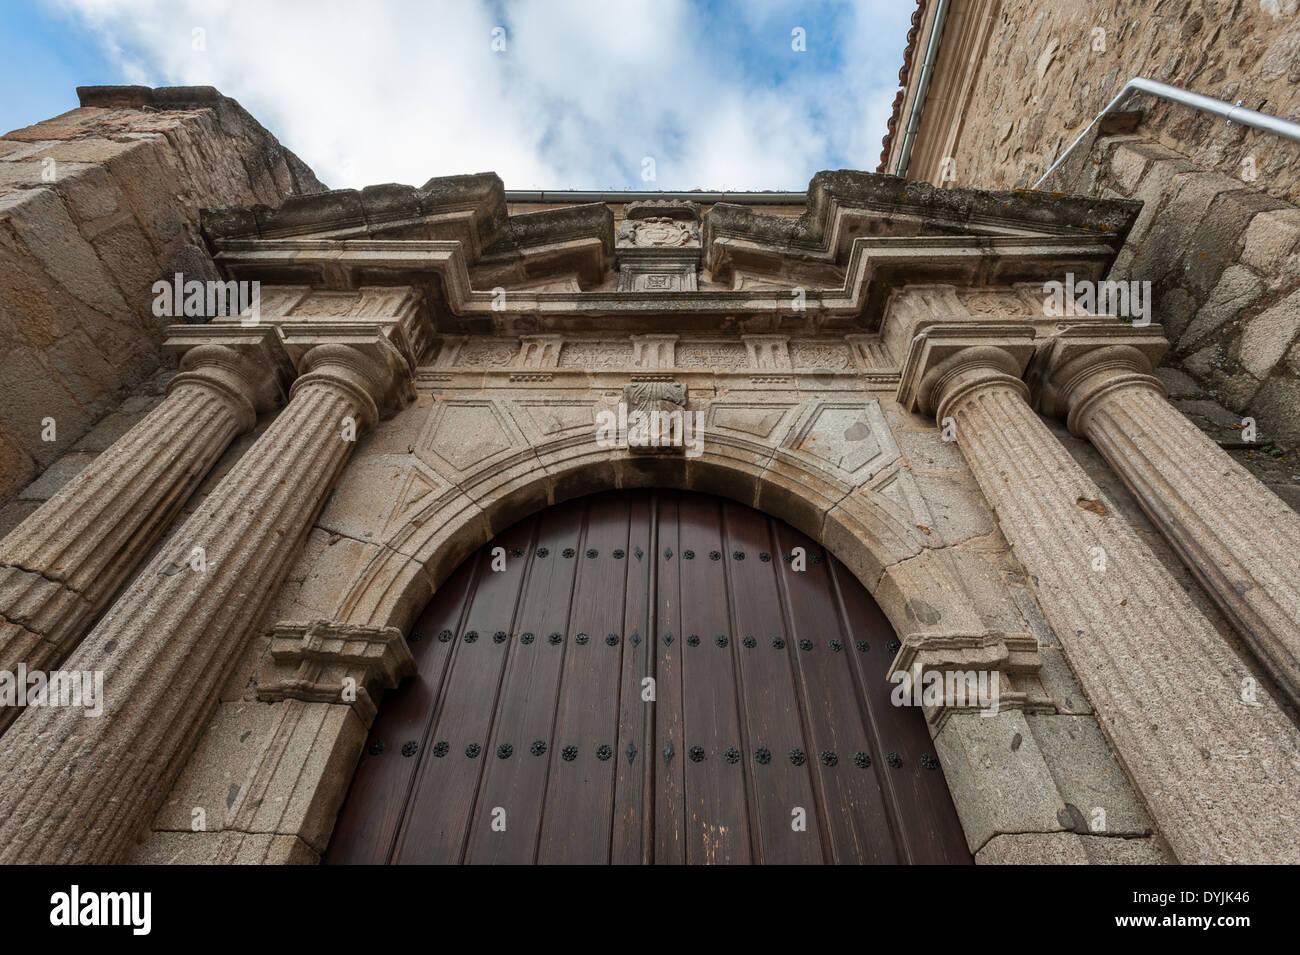 Church of Santa Maria in Hervas, Caceres, Extremadura, Spain, Europe - Stock Image